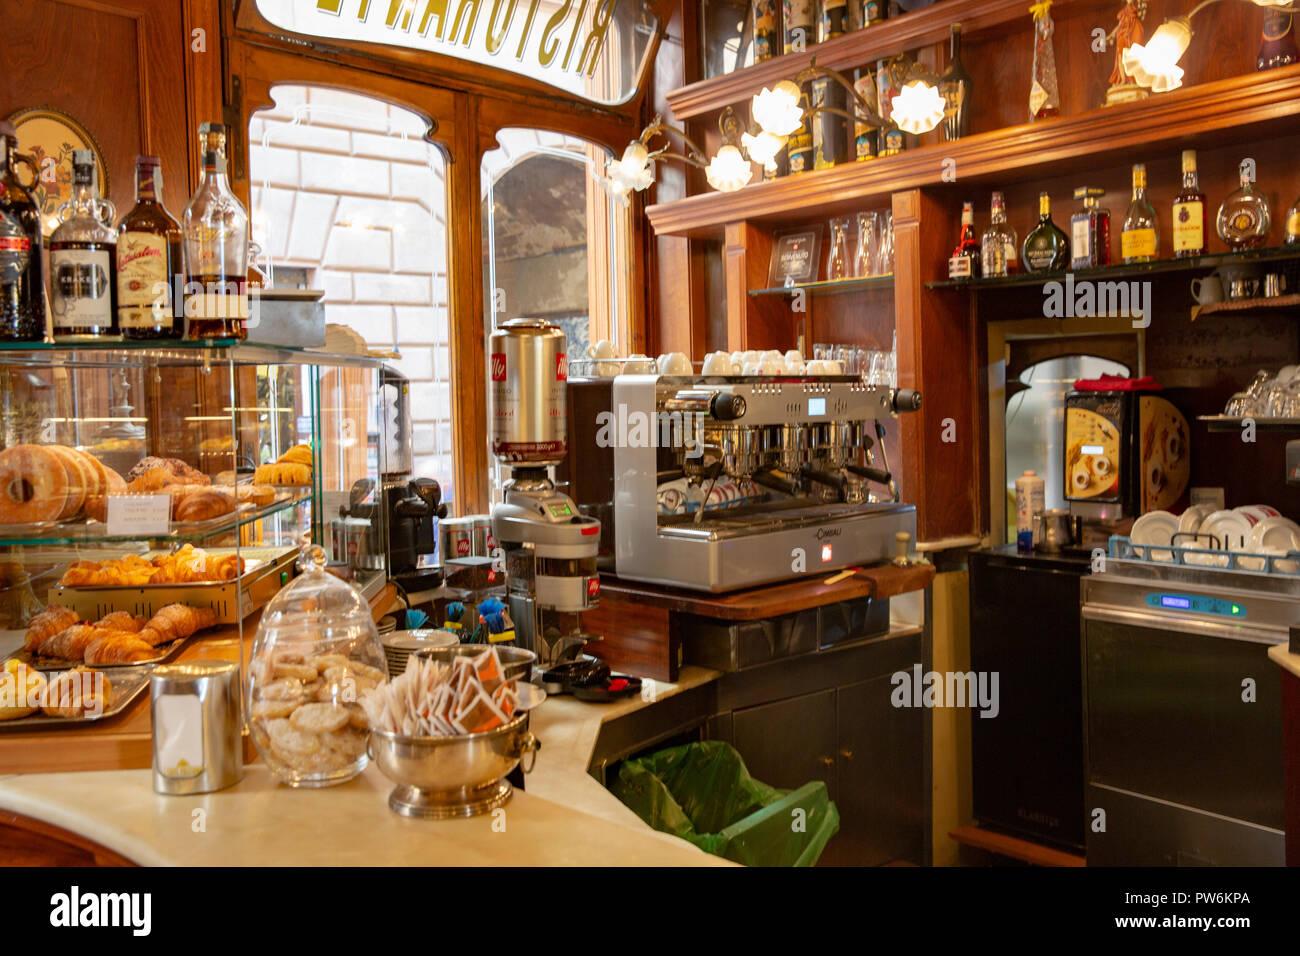 Interior Of A Traditional Italian Cafe In Montepulciano Tuscany Italy Stock Photo Alamy